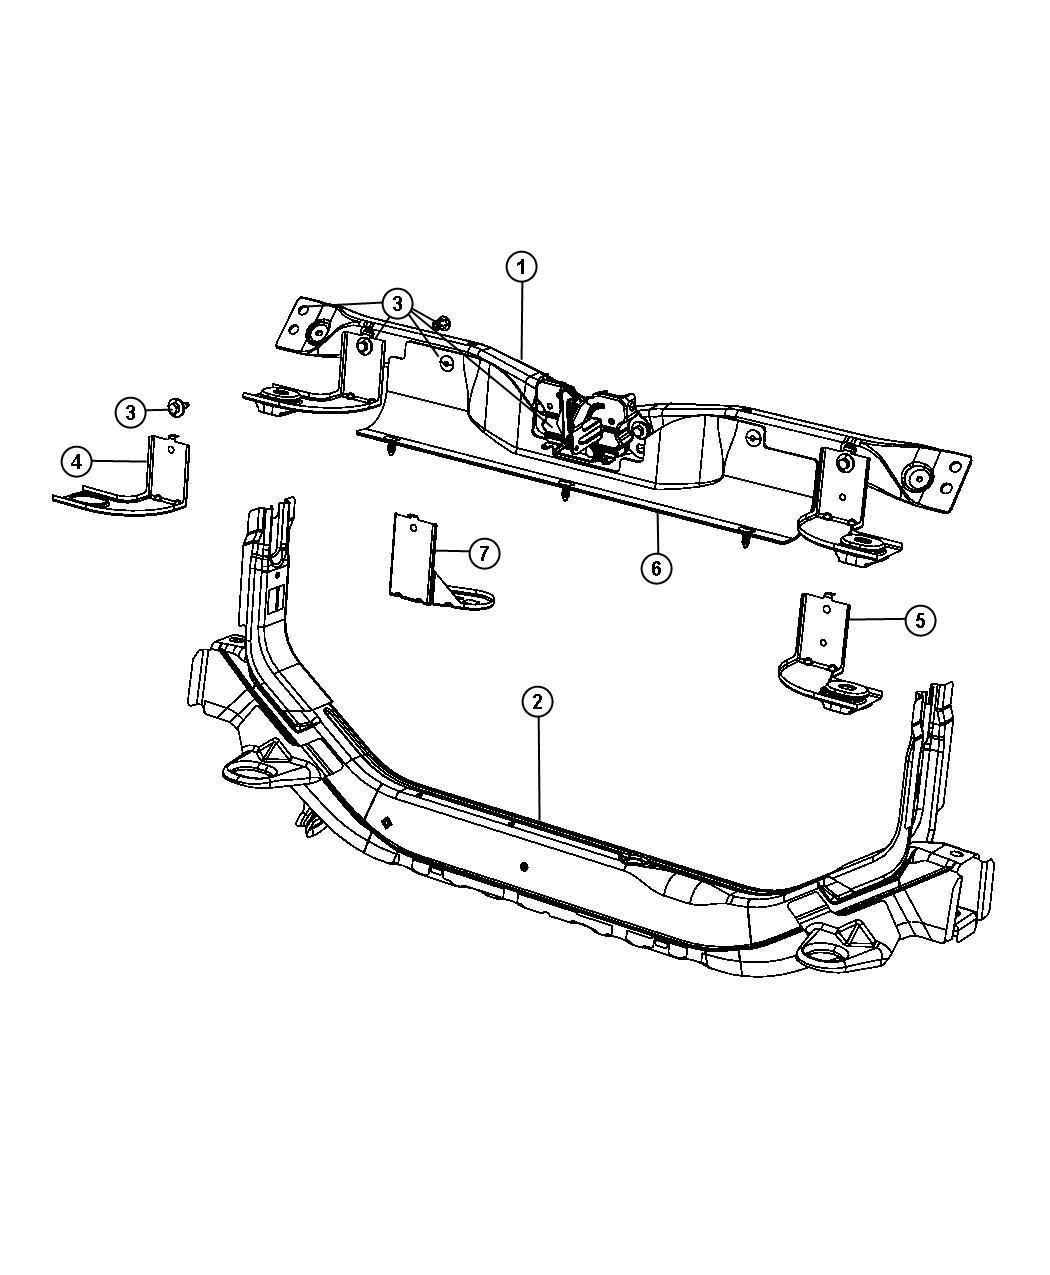 tags: #1996 camaro engine bay#1995 camaro z28 engine bay#98 camaro v6 turbo#1994  camaro engine bay#chevrolet camaro engine#2002 camaro engine bay#camaro z28